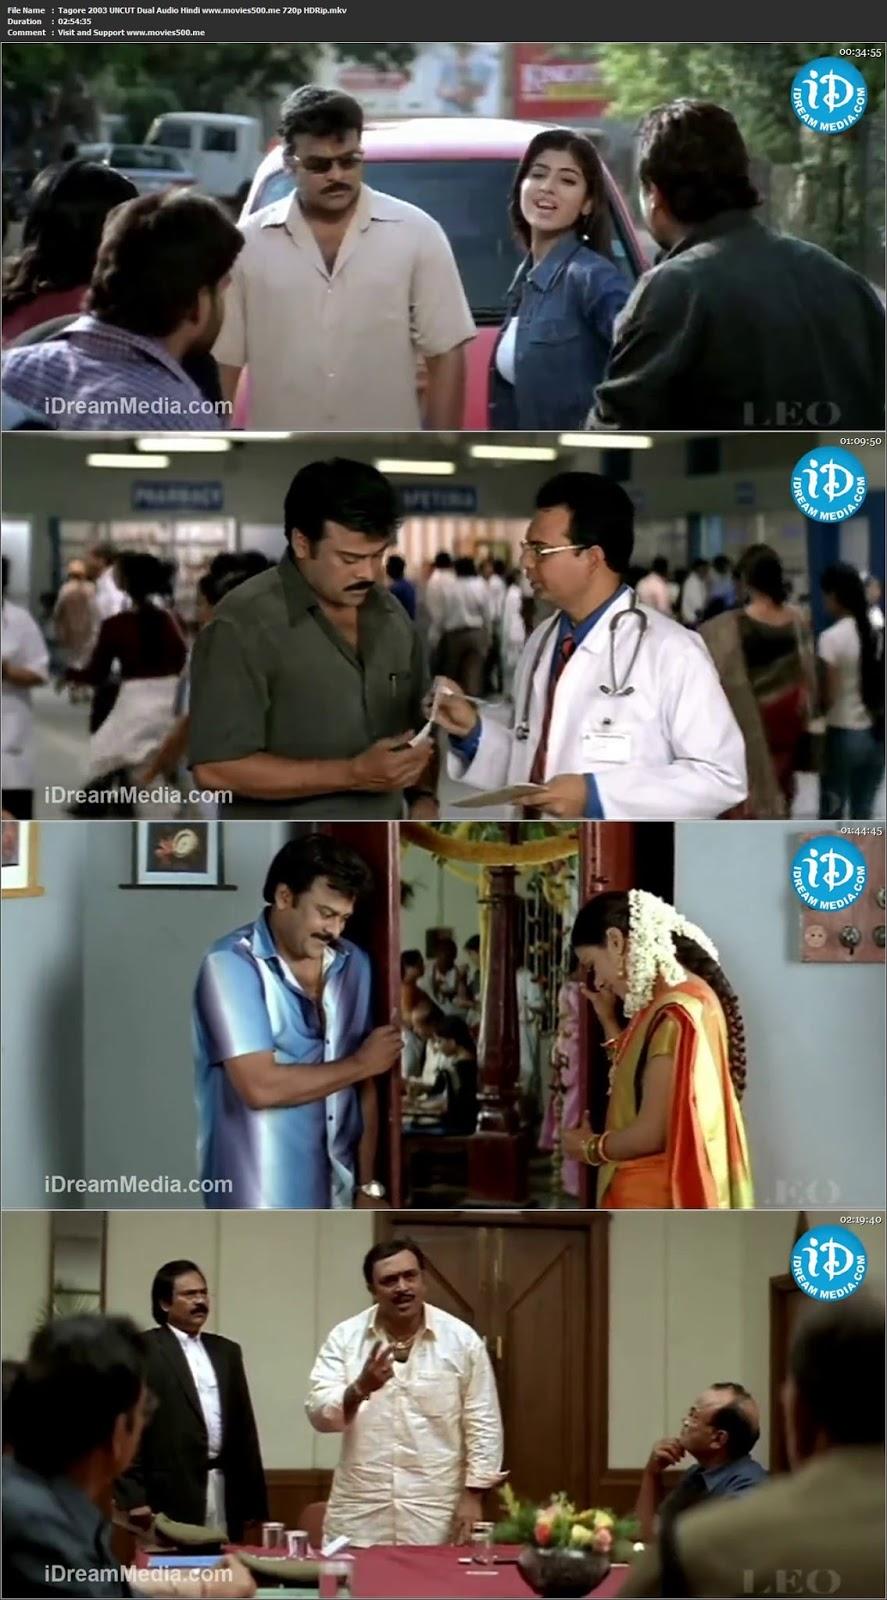 Tagore 2003 UNCUT Dual Audio Hindi Full Movie HDRip 720p at freedomcopy.com